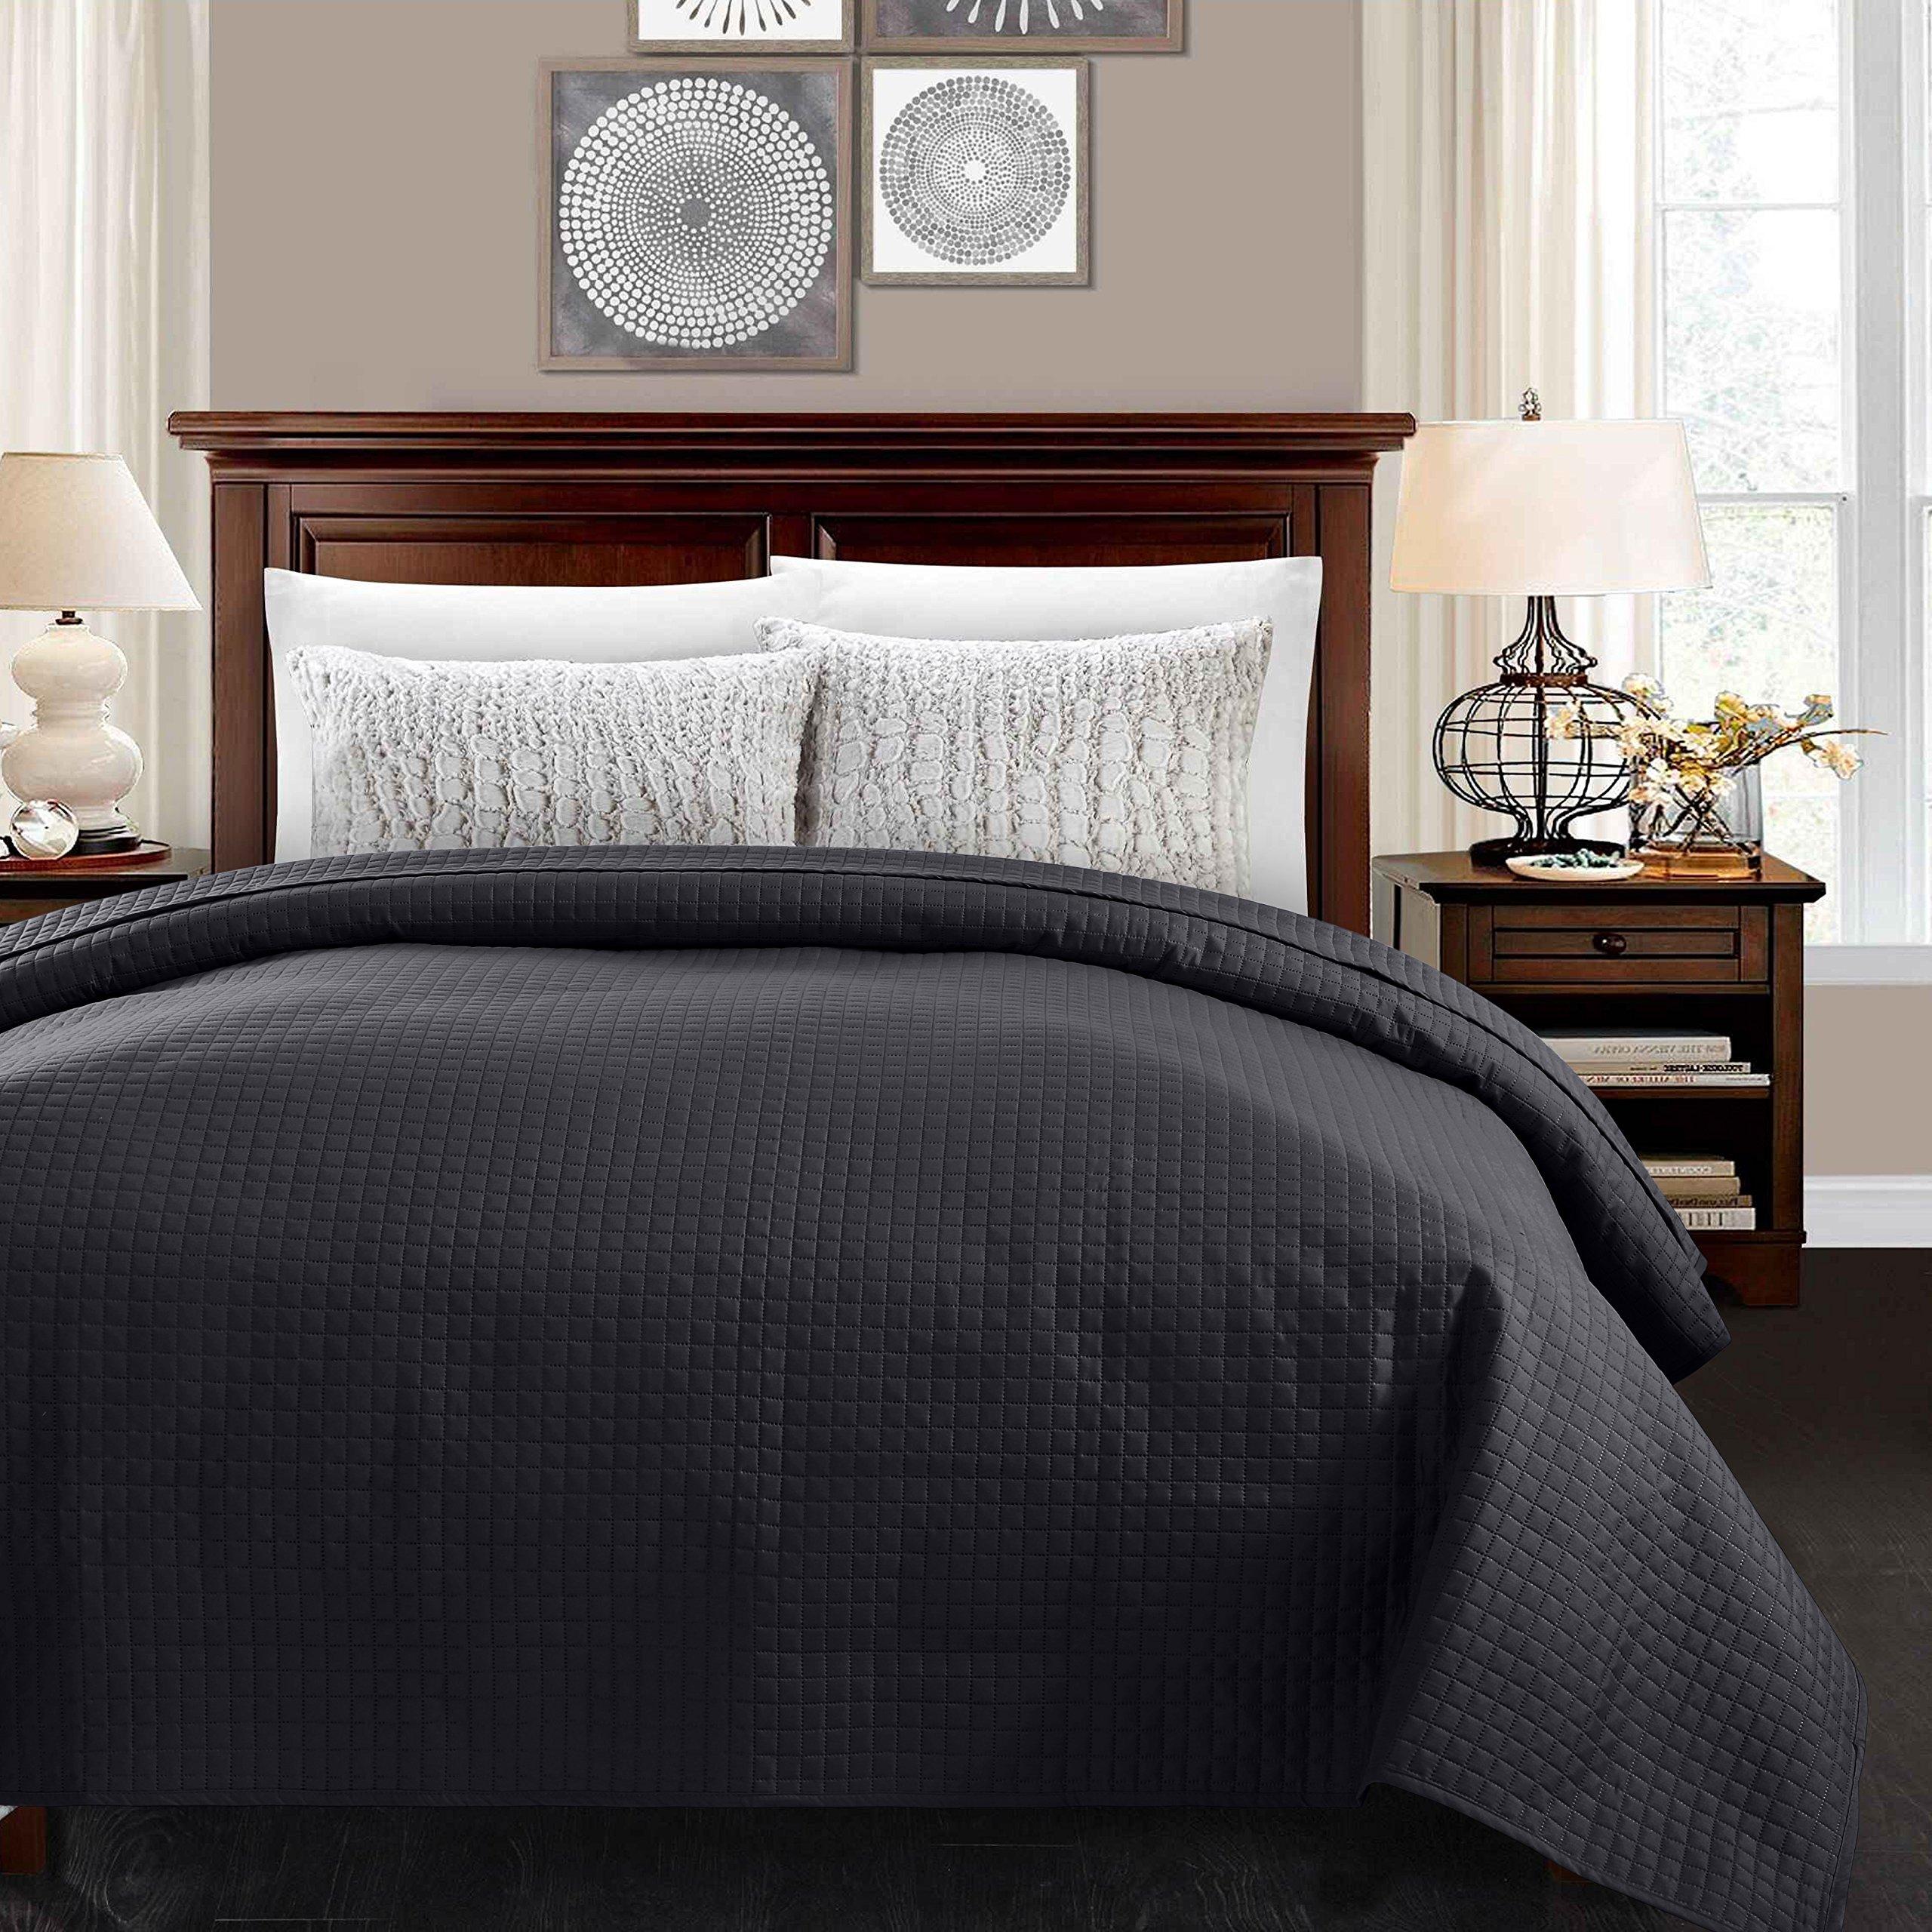 ALPHA HOME Lightweight Bedspread Twin Size Summer Blanket Bed Quilt, Black